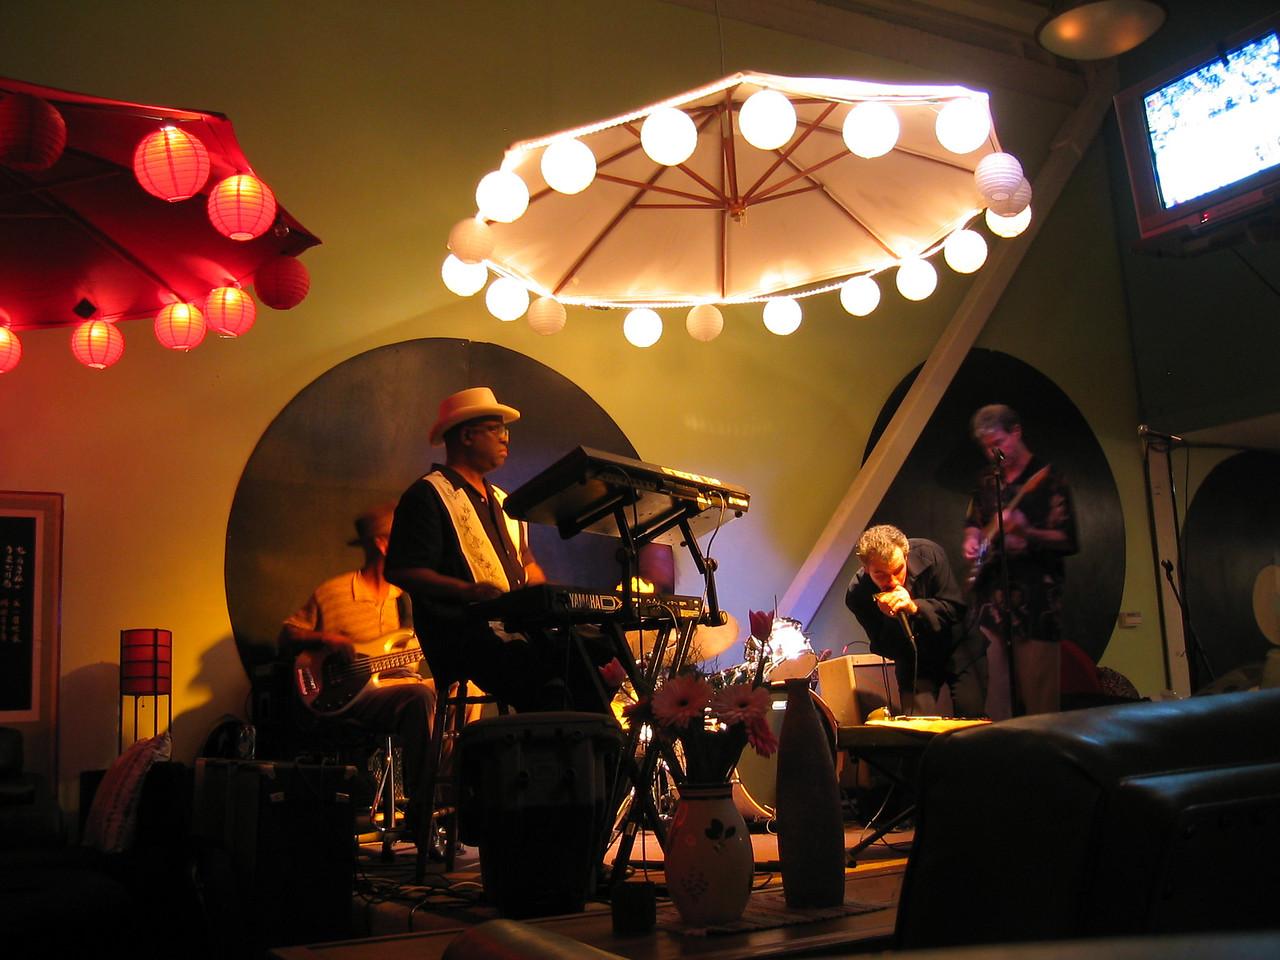 2004 05 15 Saturday - @ Everett & Jones back room jazz - Lounge Lizards